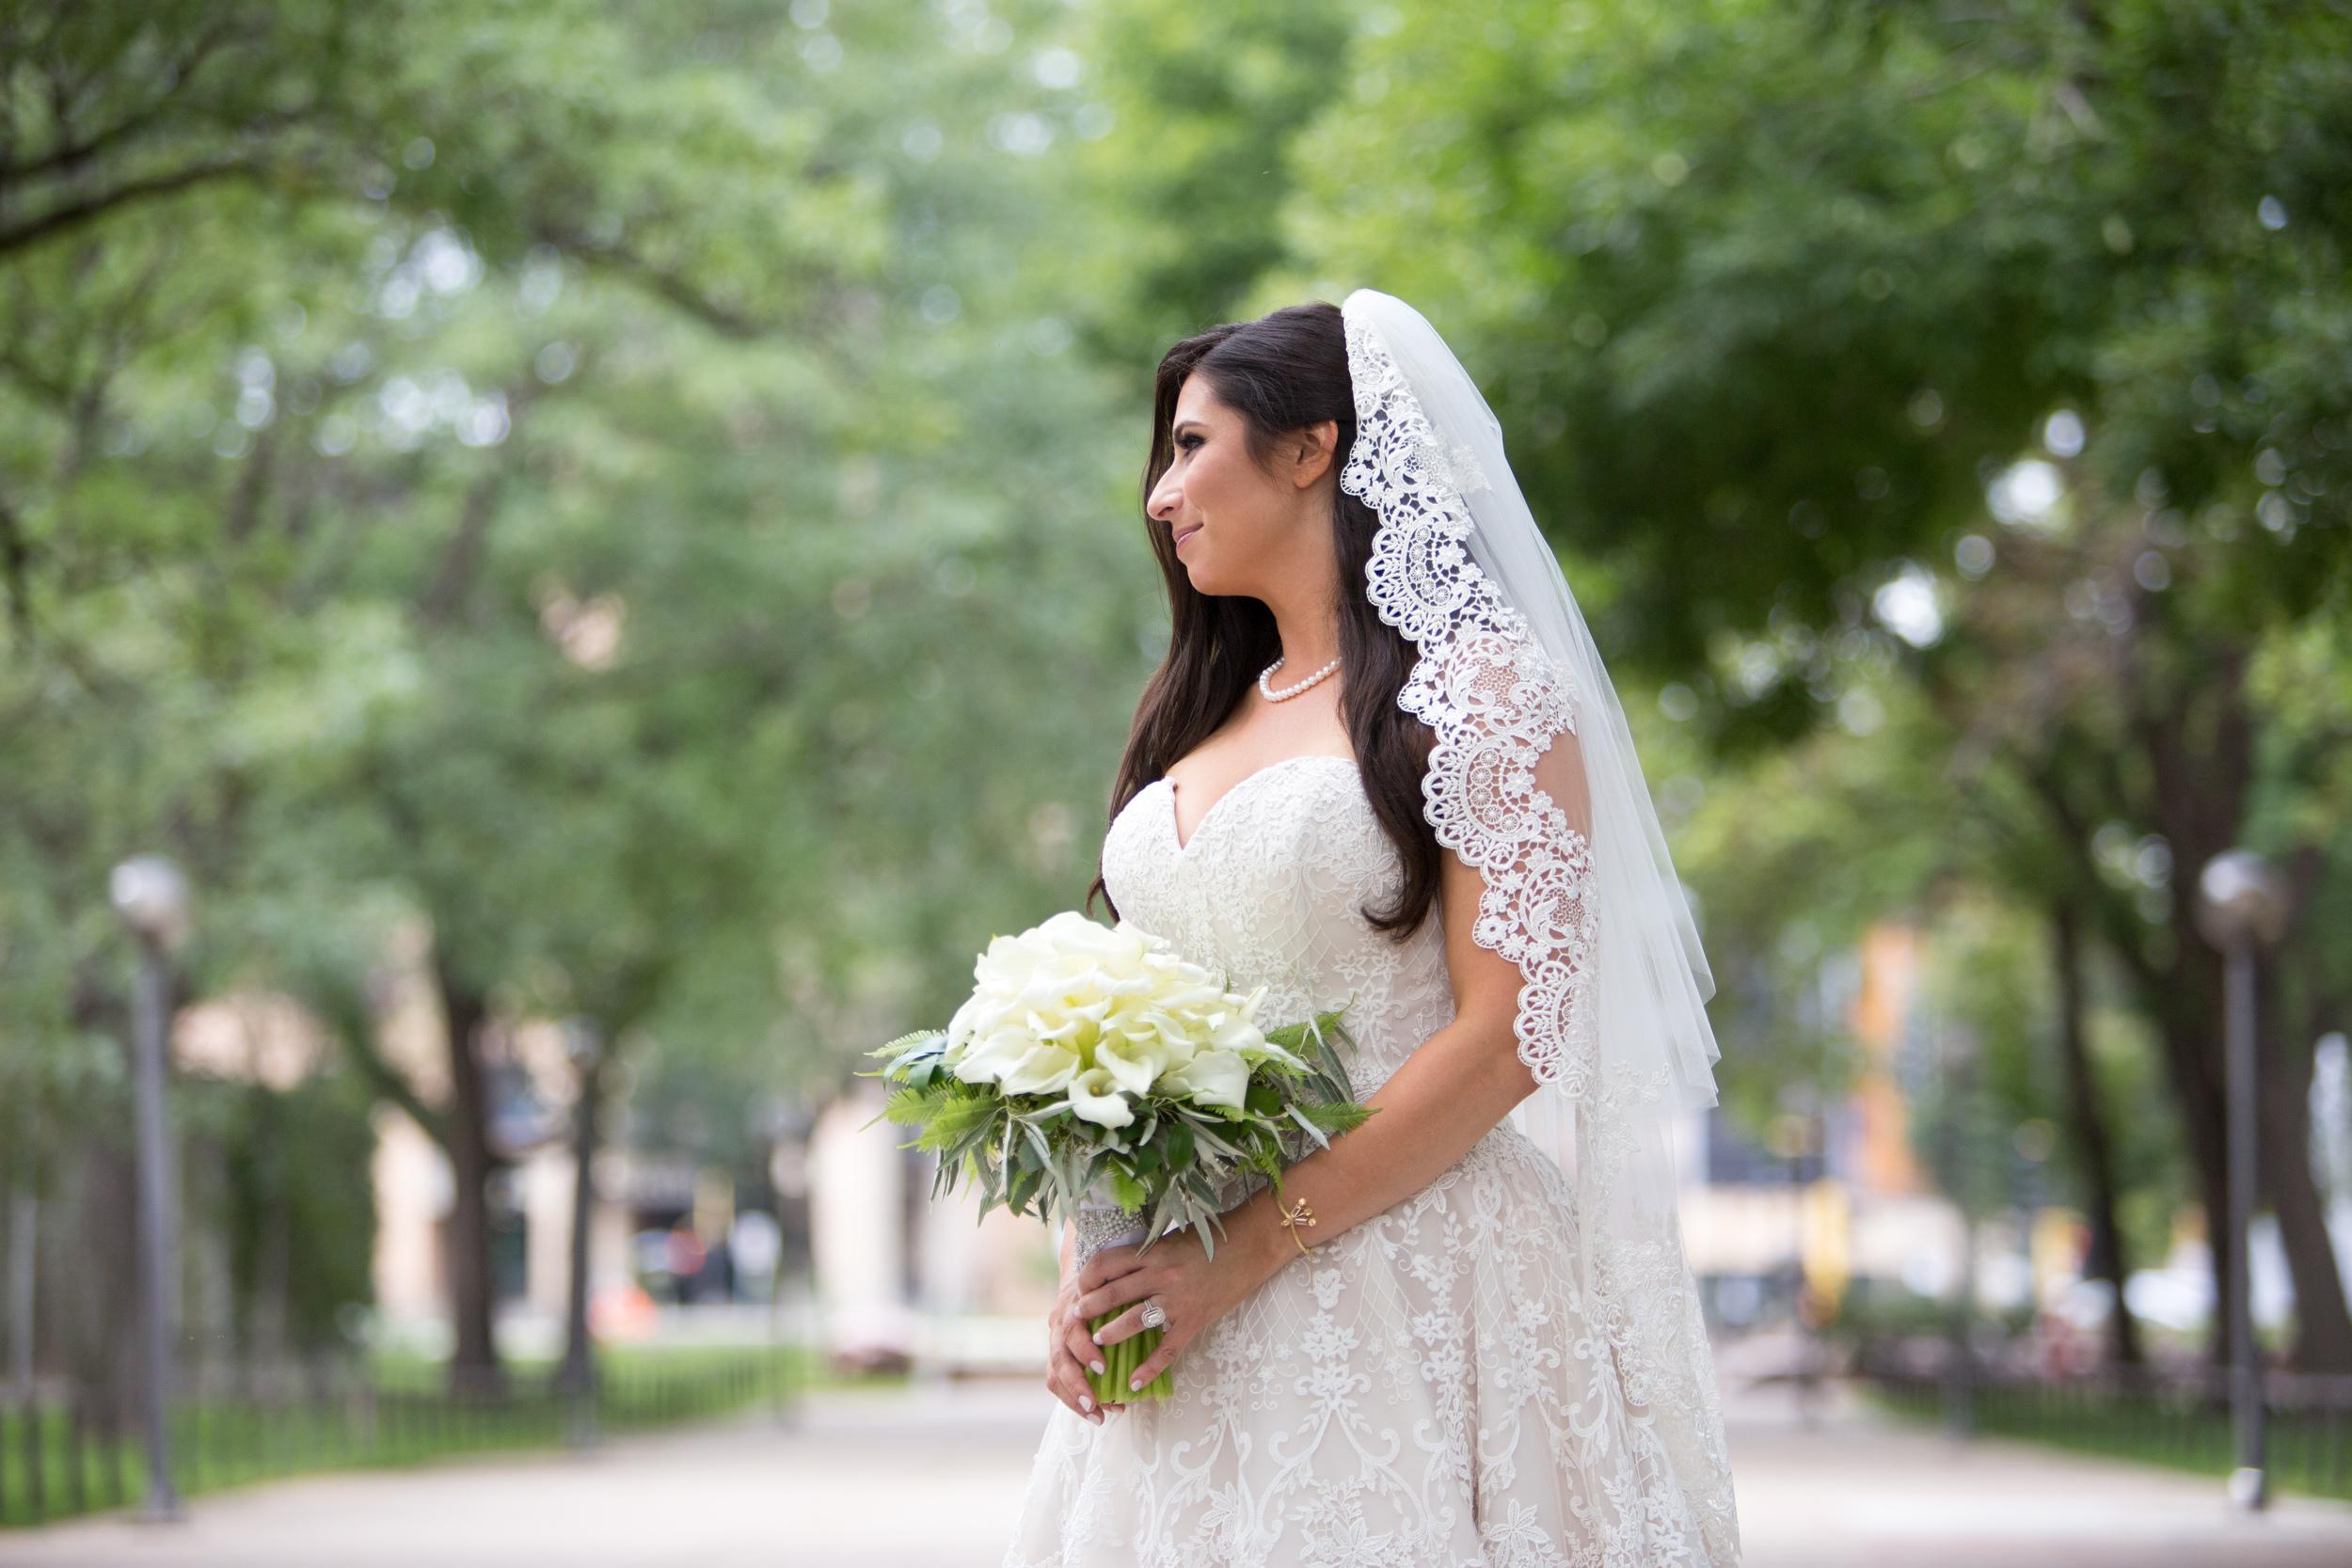 Acowsay_Cinema_MN_Wedding_Bride.jpg